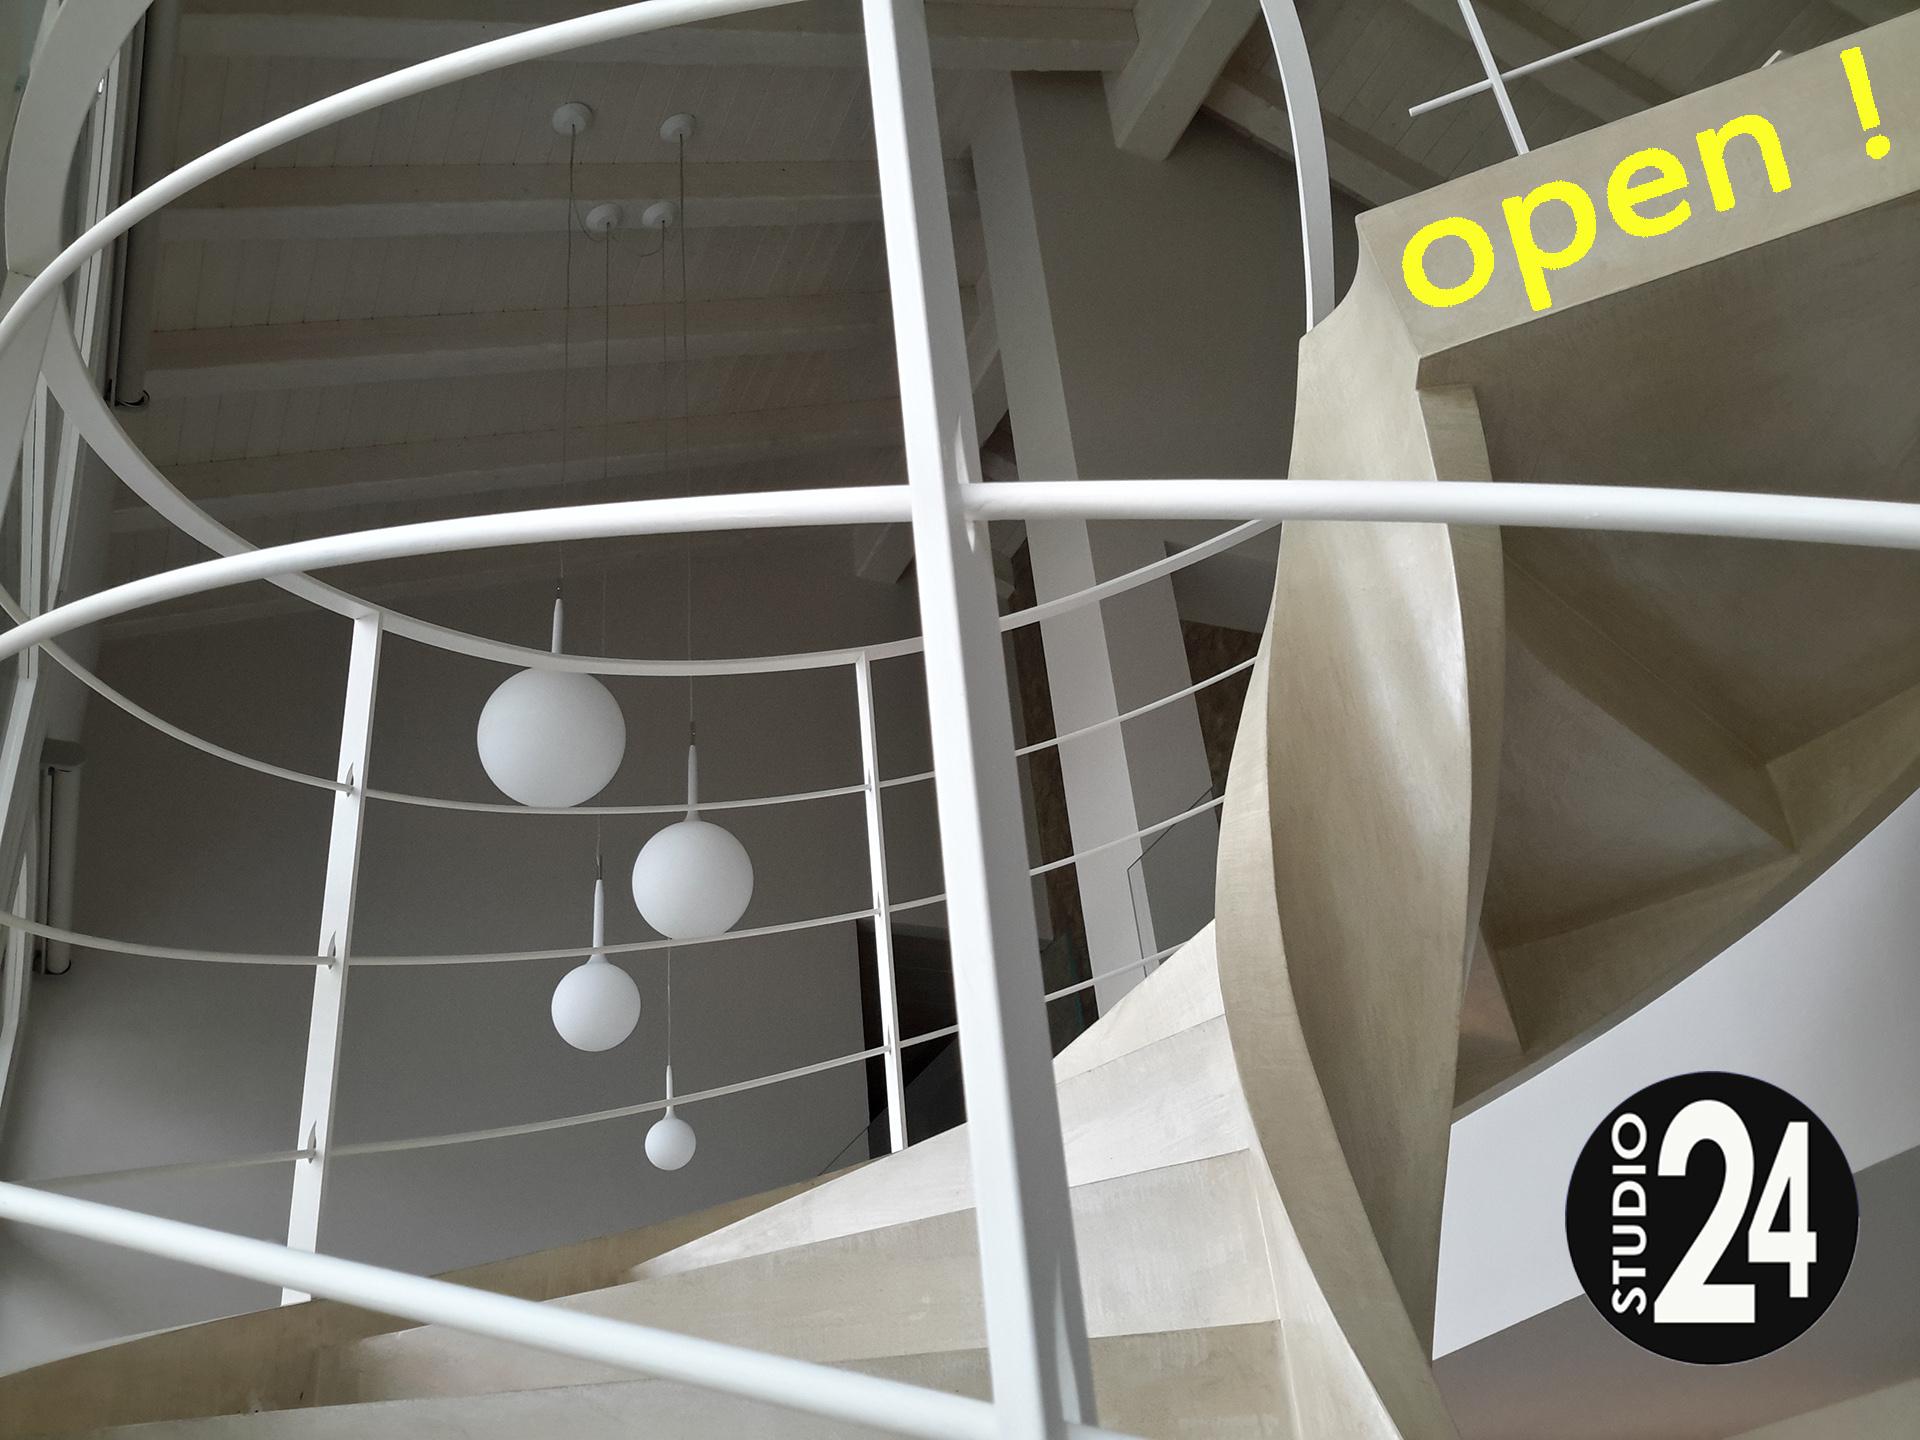 Studi Di Architettura Cuneo studio24 - open!